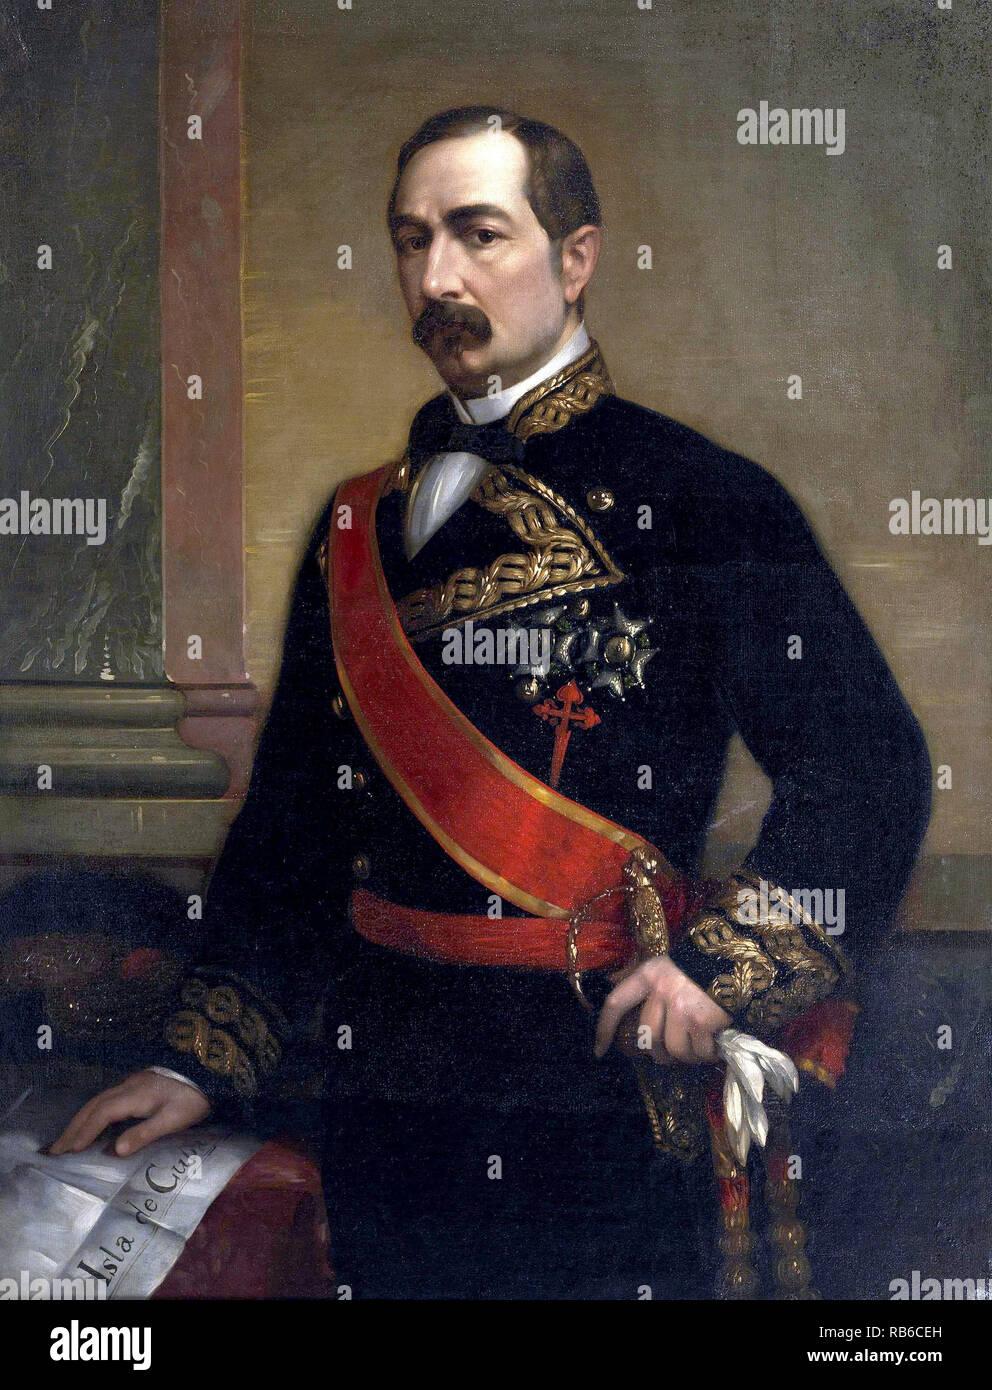 José Gutiérrez De la Concha, 1st Marquess of Havana, 1st Viscount of Cuba, Grandee of Spain (1809 – 1895) Spanish politician and Prime Minister of Spain - Stock Image